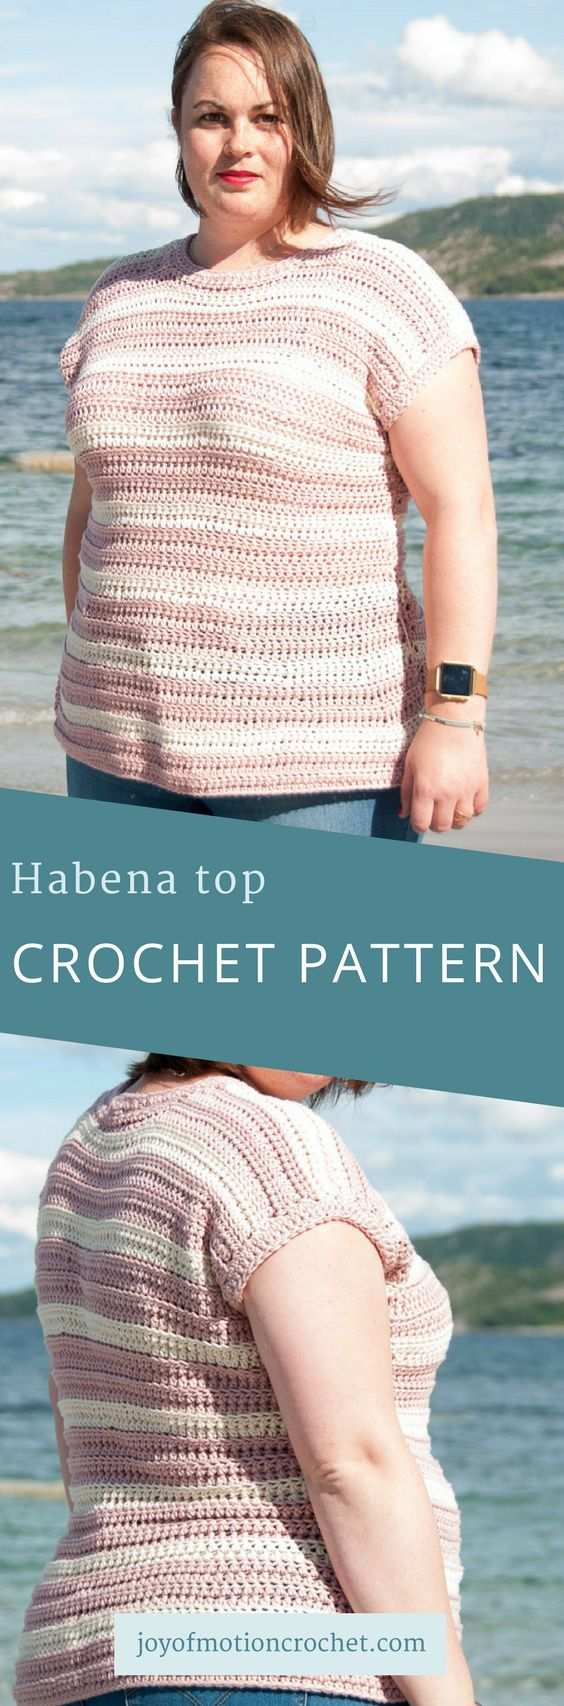 Habena top crochet pattern. T-shirt crochet pattern. Quick crochet pattern. Summer crochet pattern. Woman's top crochet pattern. #topcrochetpattern #crochettop #woolandthegang #crochetpattern #tshirtcrochetpattern